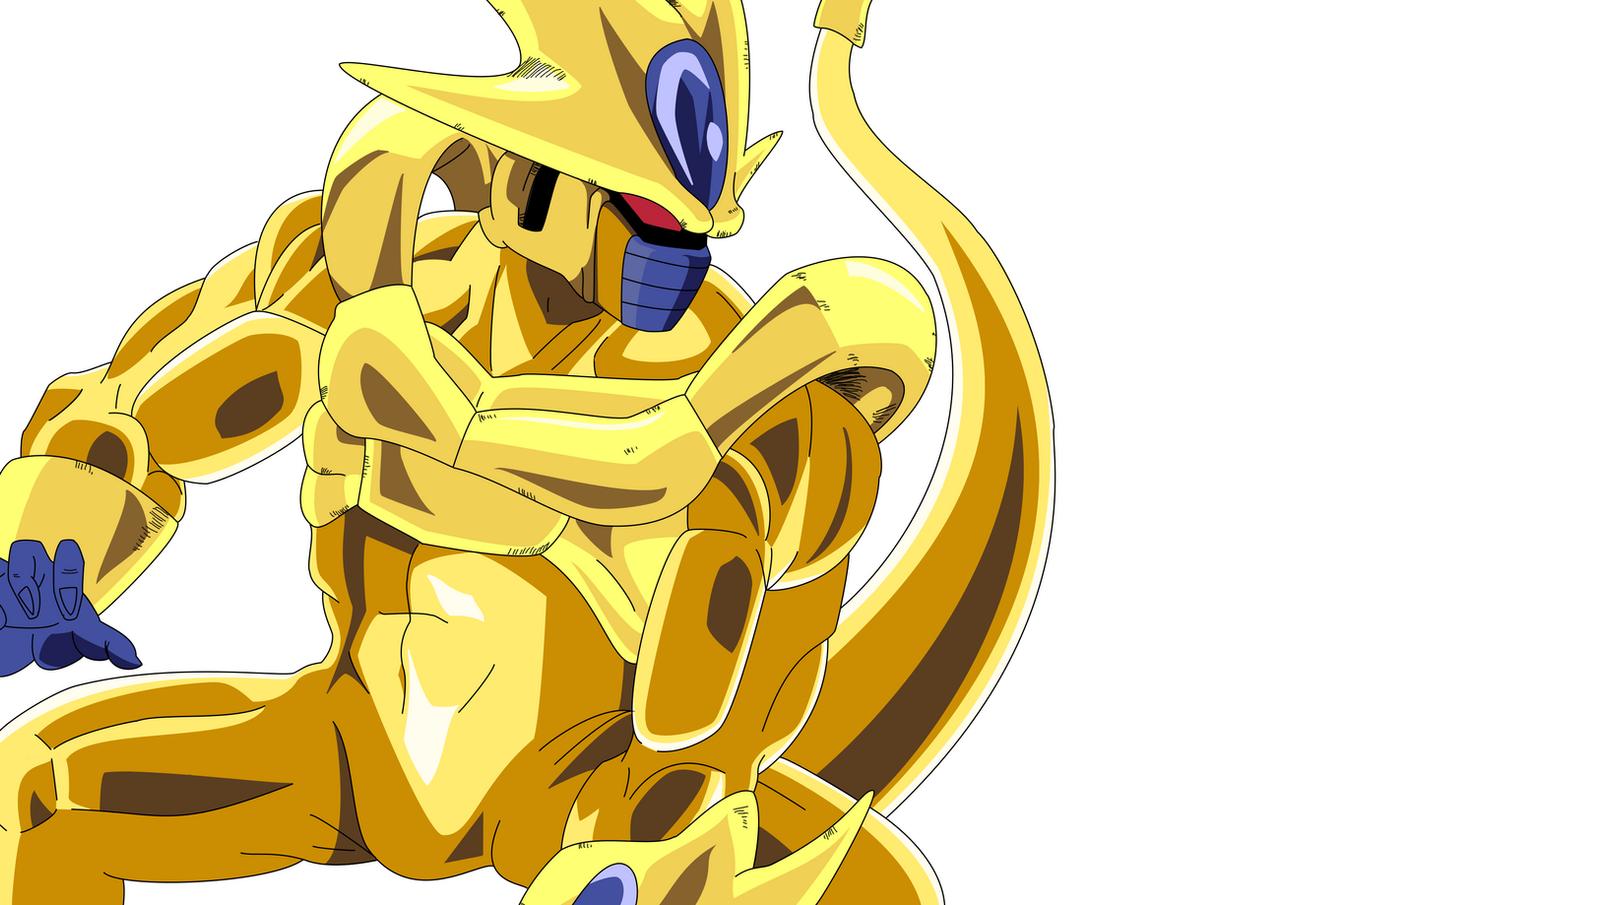 Gold 5th Form Cooler (M5) vs Evil Boo - DBZeta - DBZ Forum